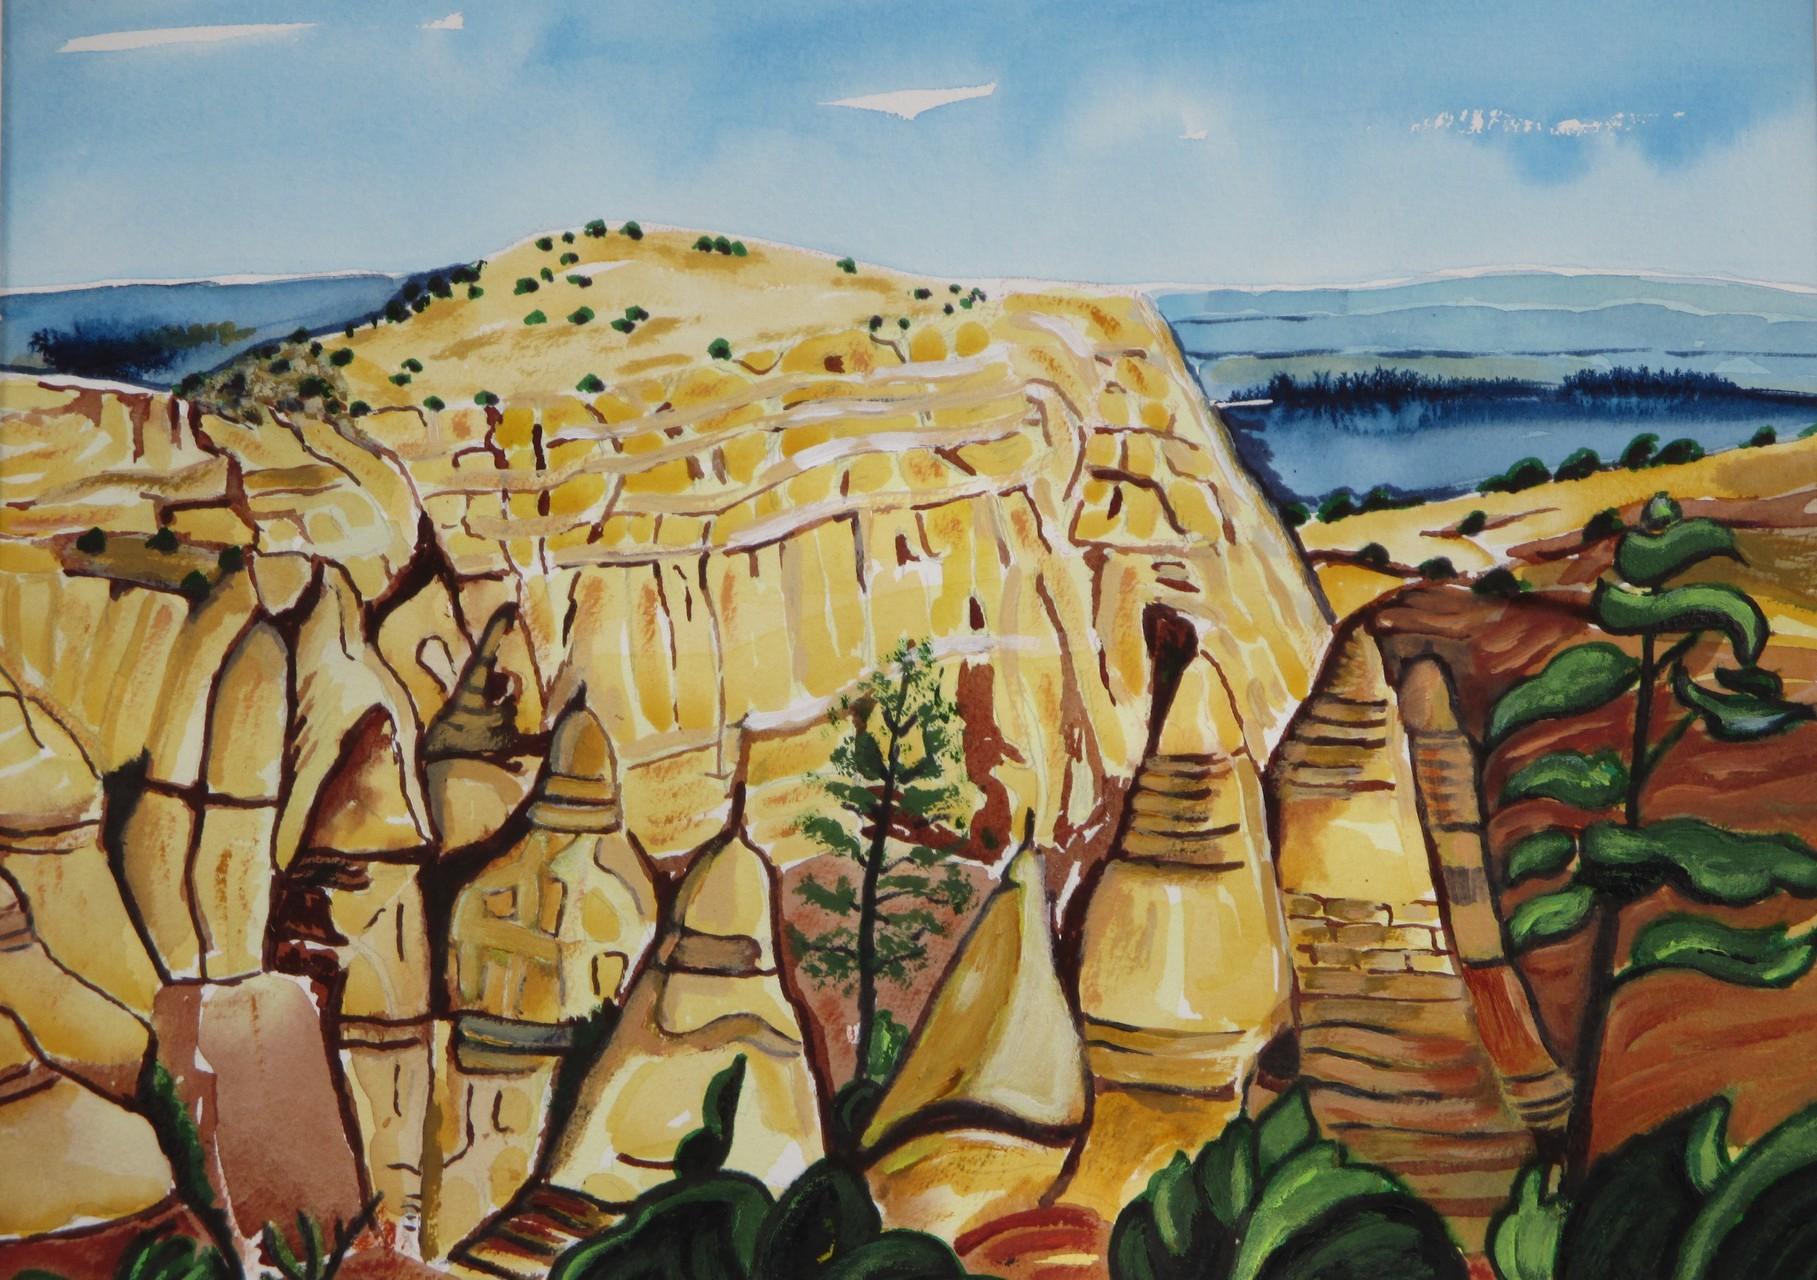 Tent Rocks, watercolor, 15.5 x 11.5, 2015 SOLD